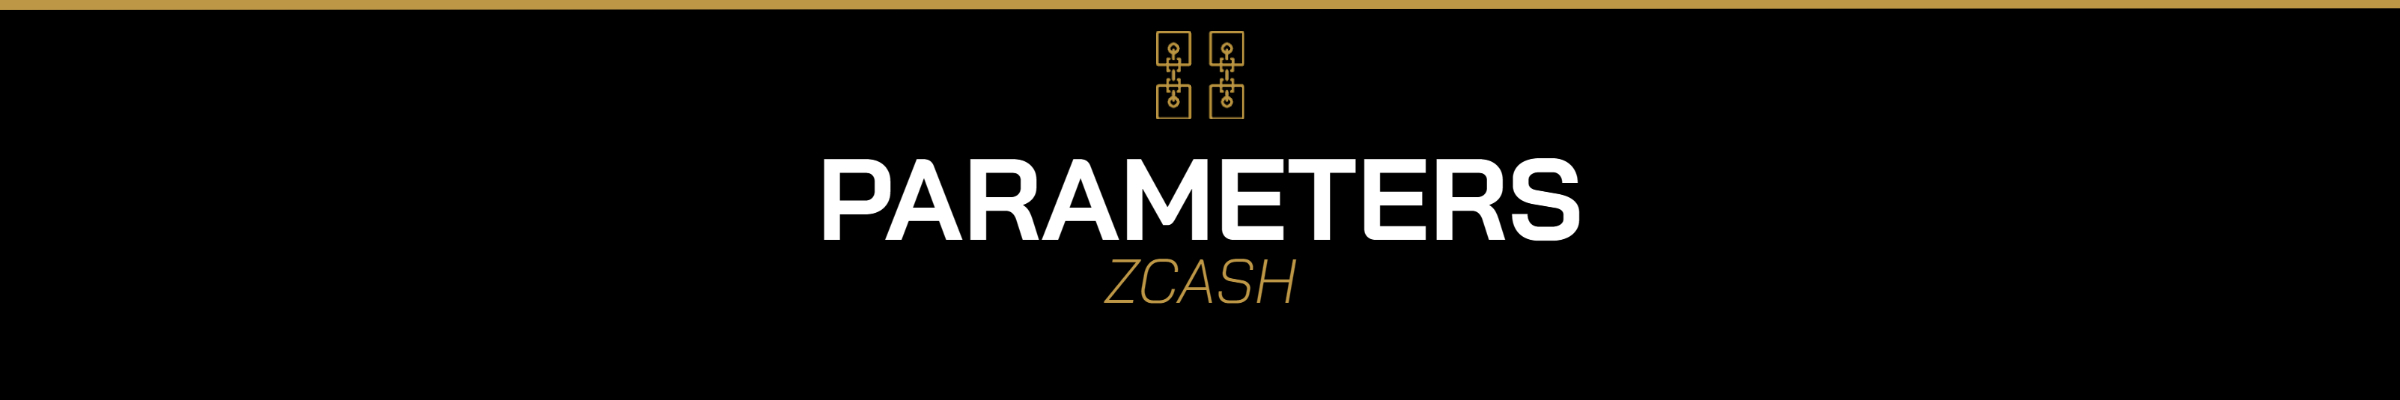 zcash parameters